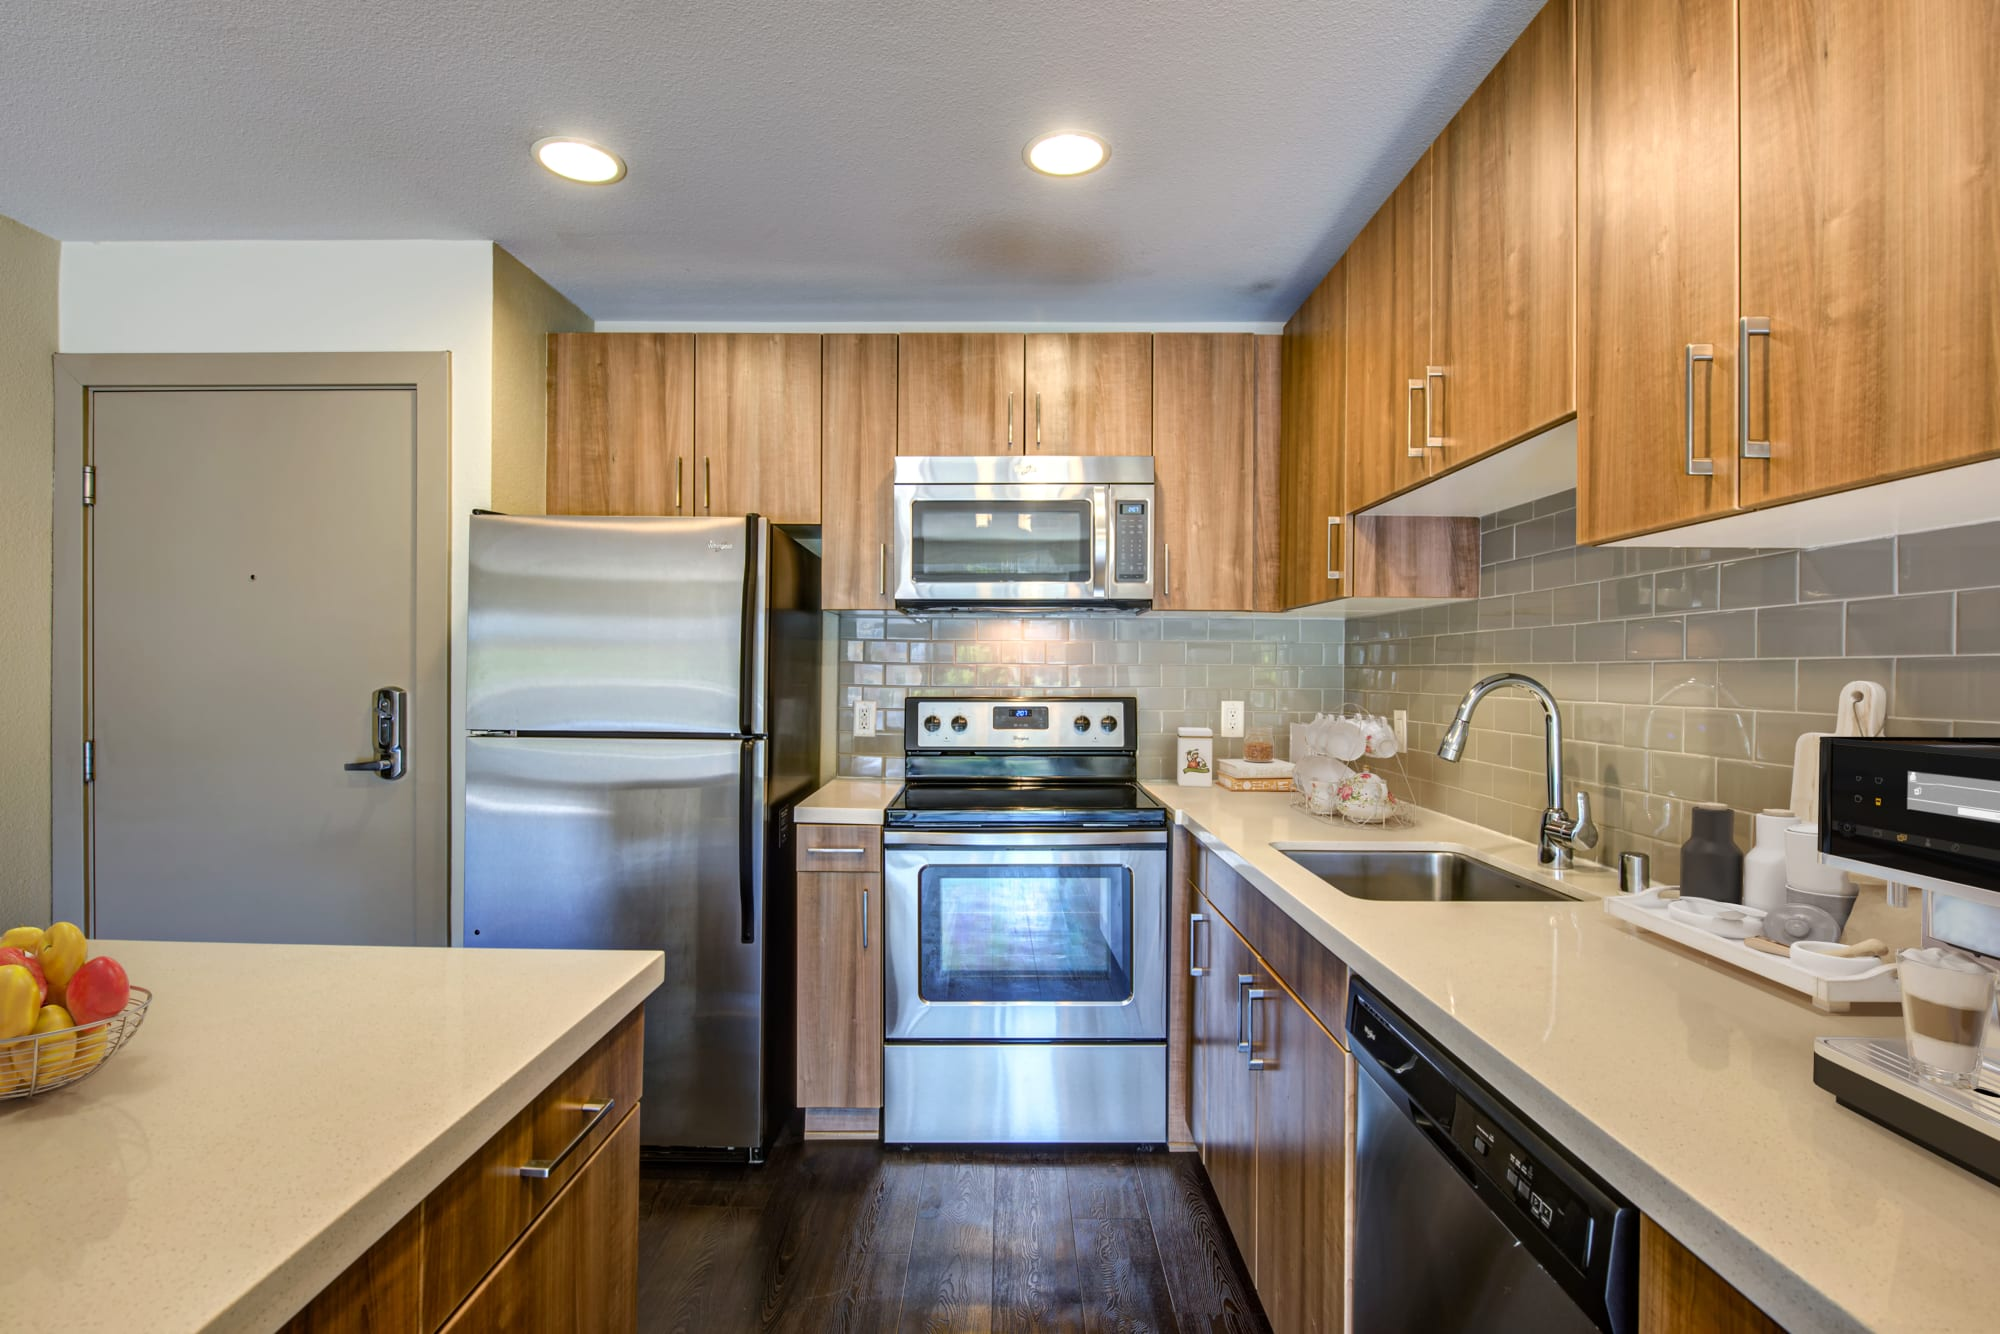 Modern kitchen with quartz countertops at Harborside Marina Bay Apartments in Marina del Rey, California